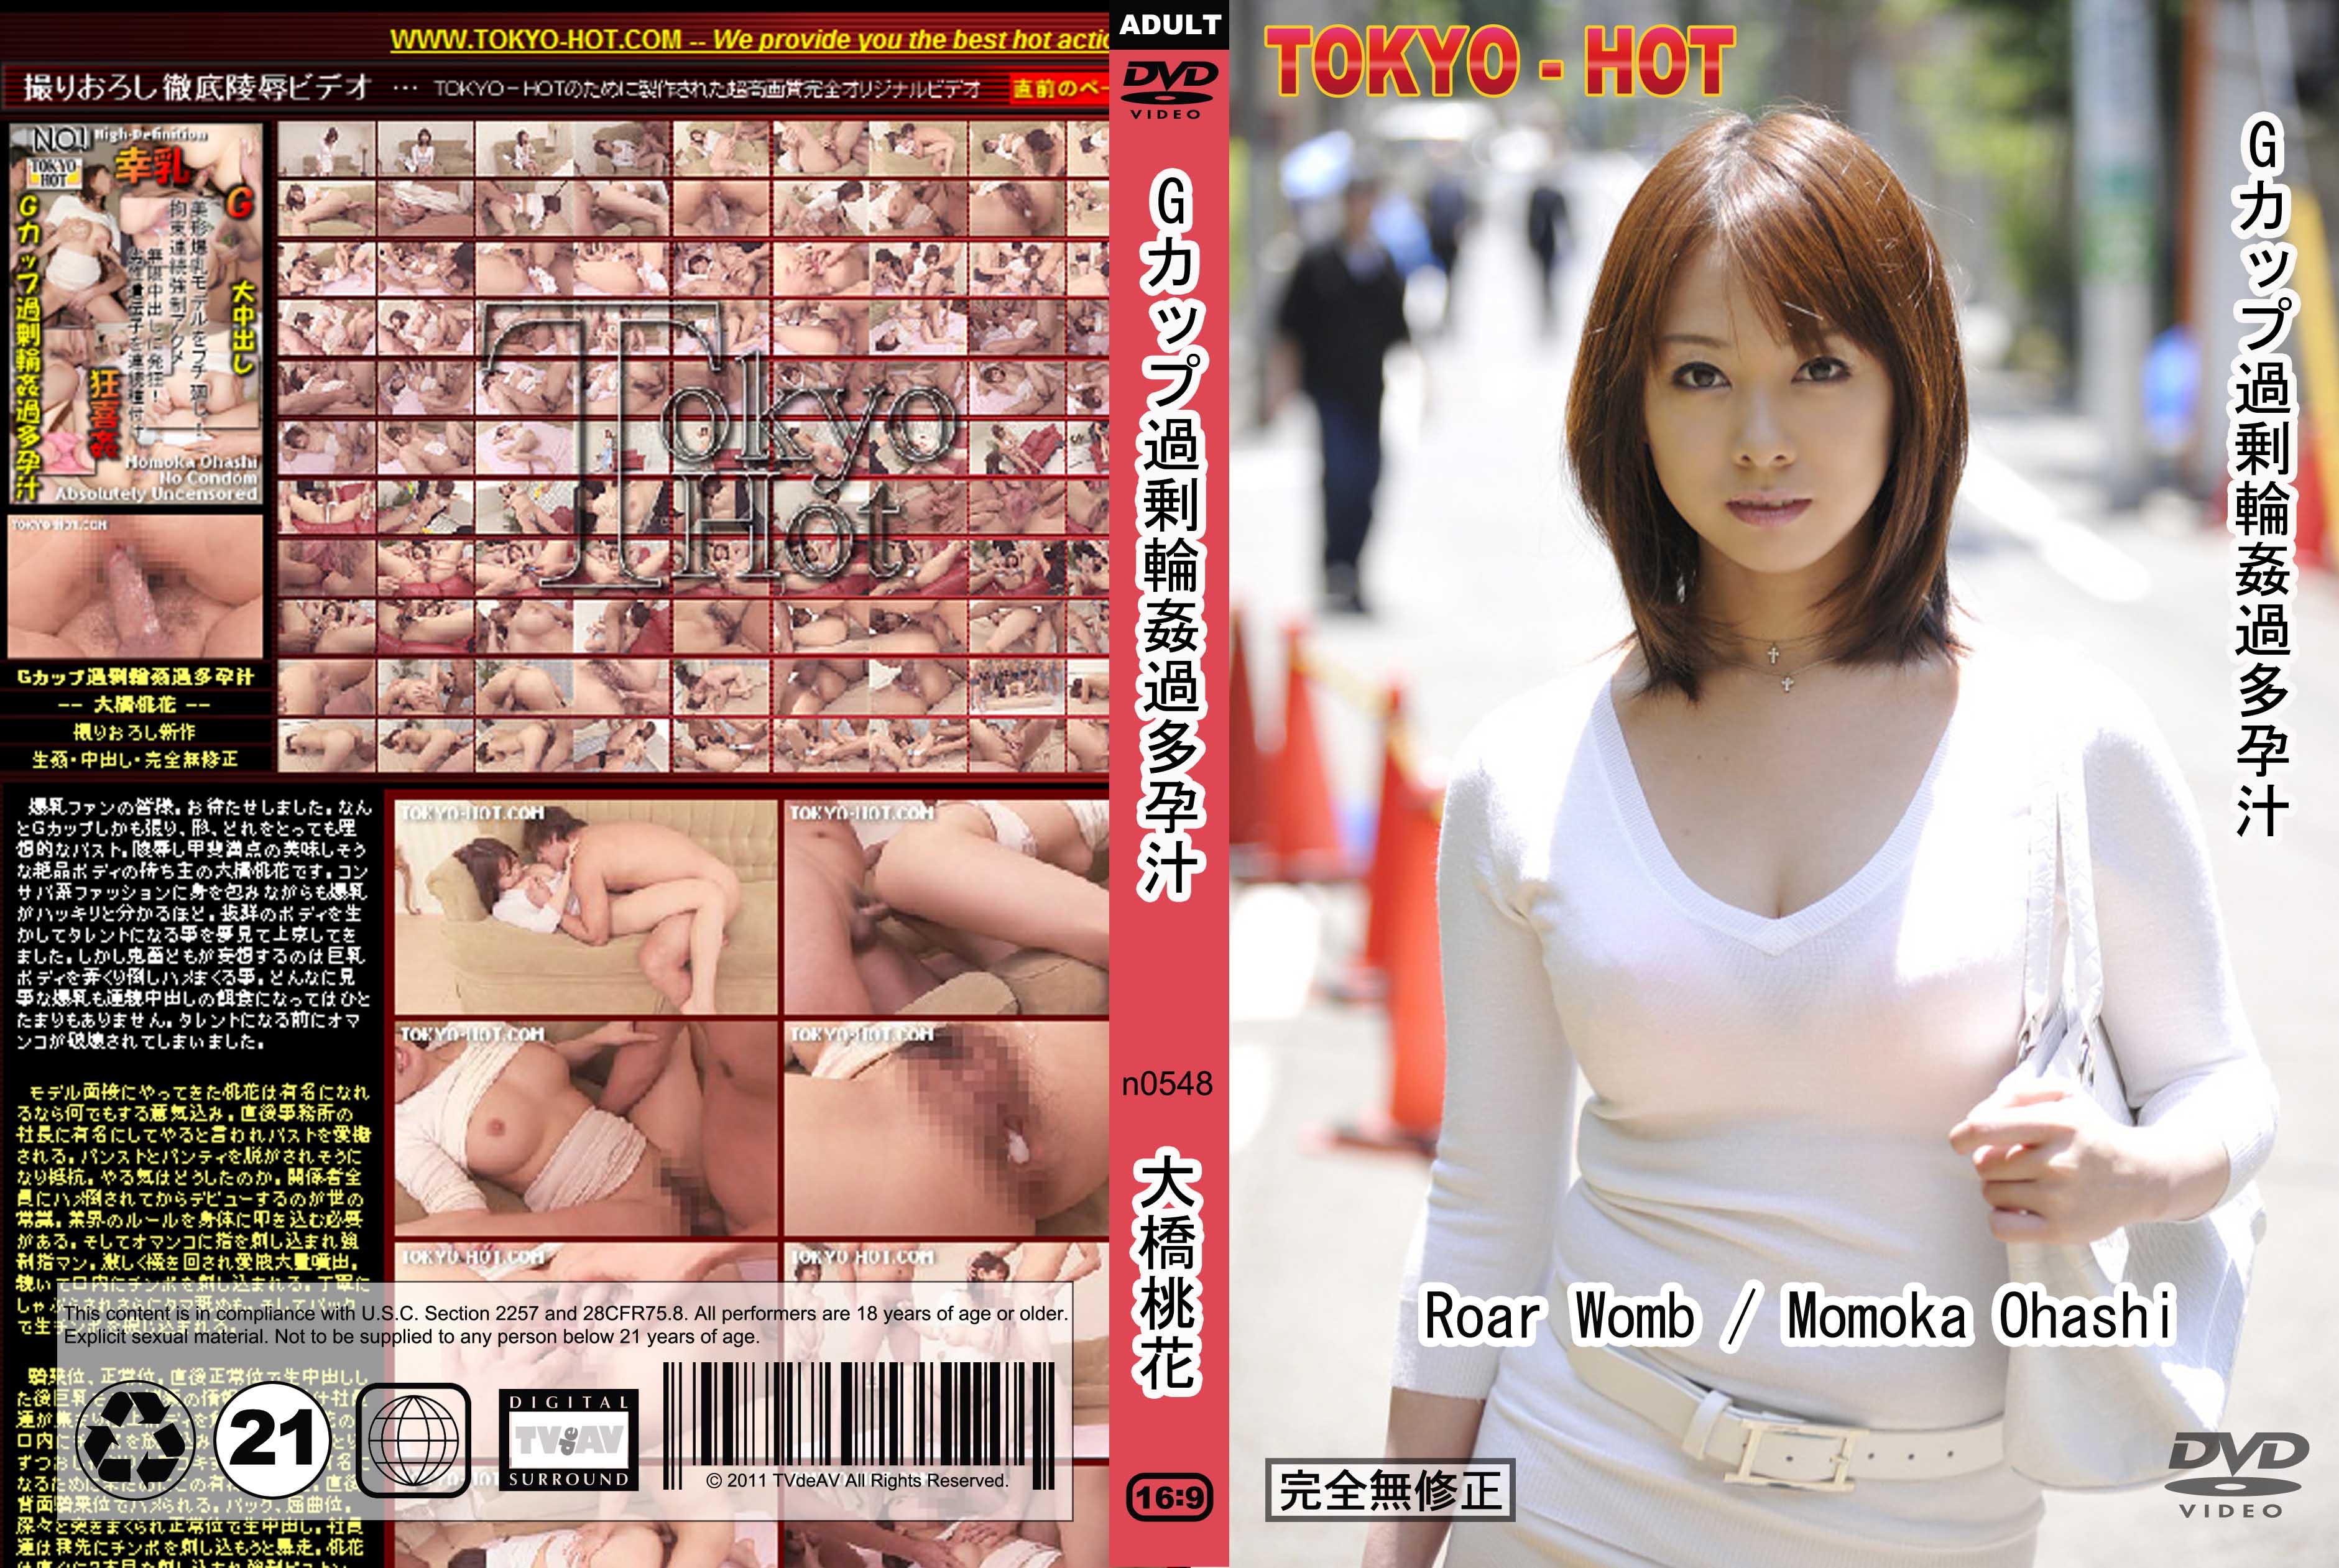 tokyo-hot-n0548-Gカップ過剰輪カン過多孕汁